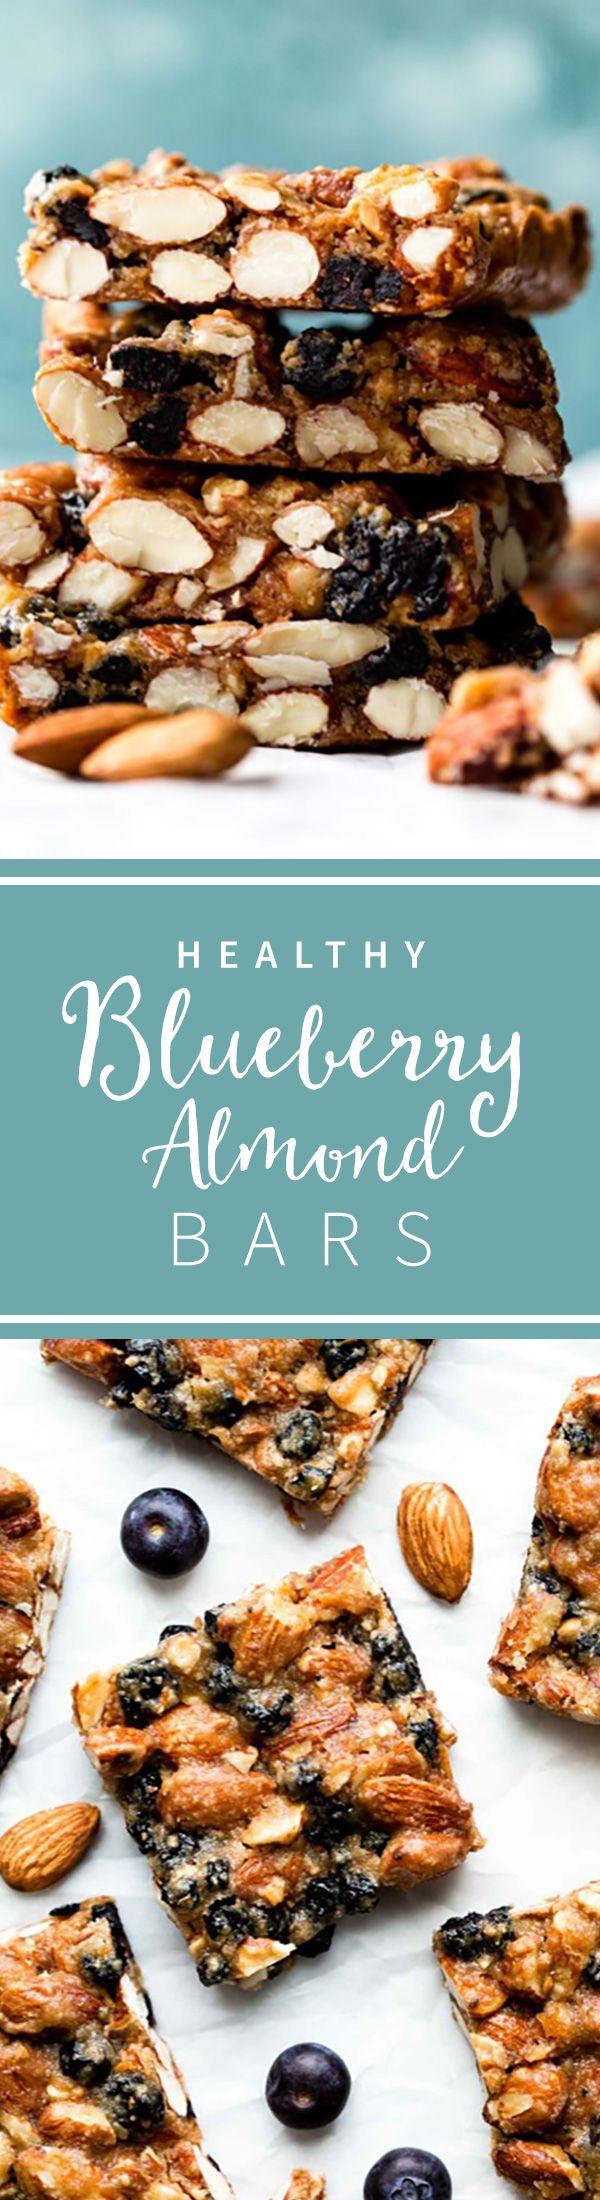 Healthy blueberry copycat KIND bars! Gluten free and easy to make! Blueberry almond snack bars on sallysbakingaddiction.com